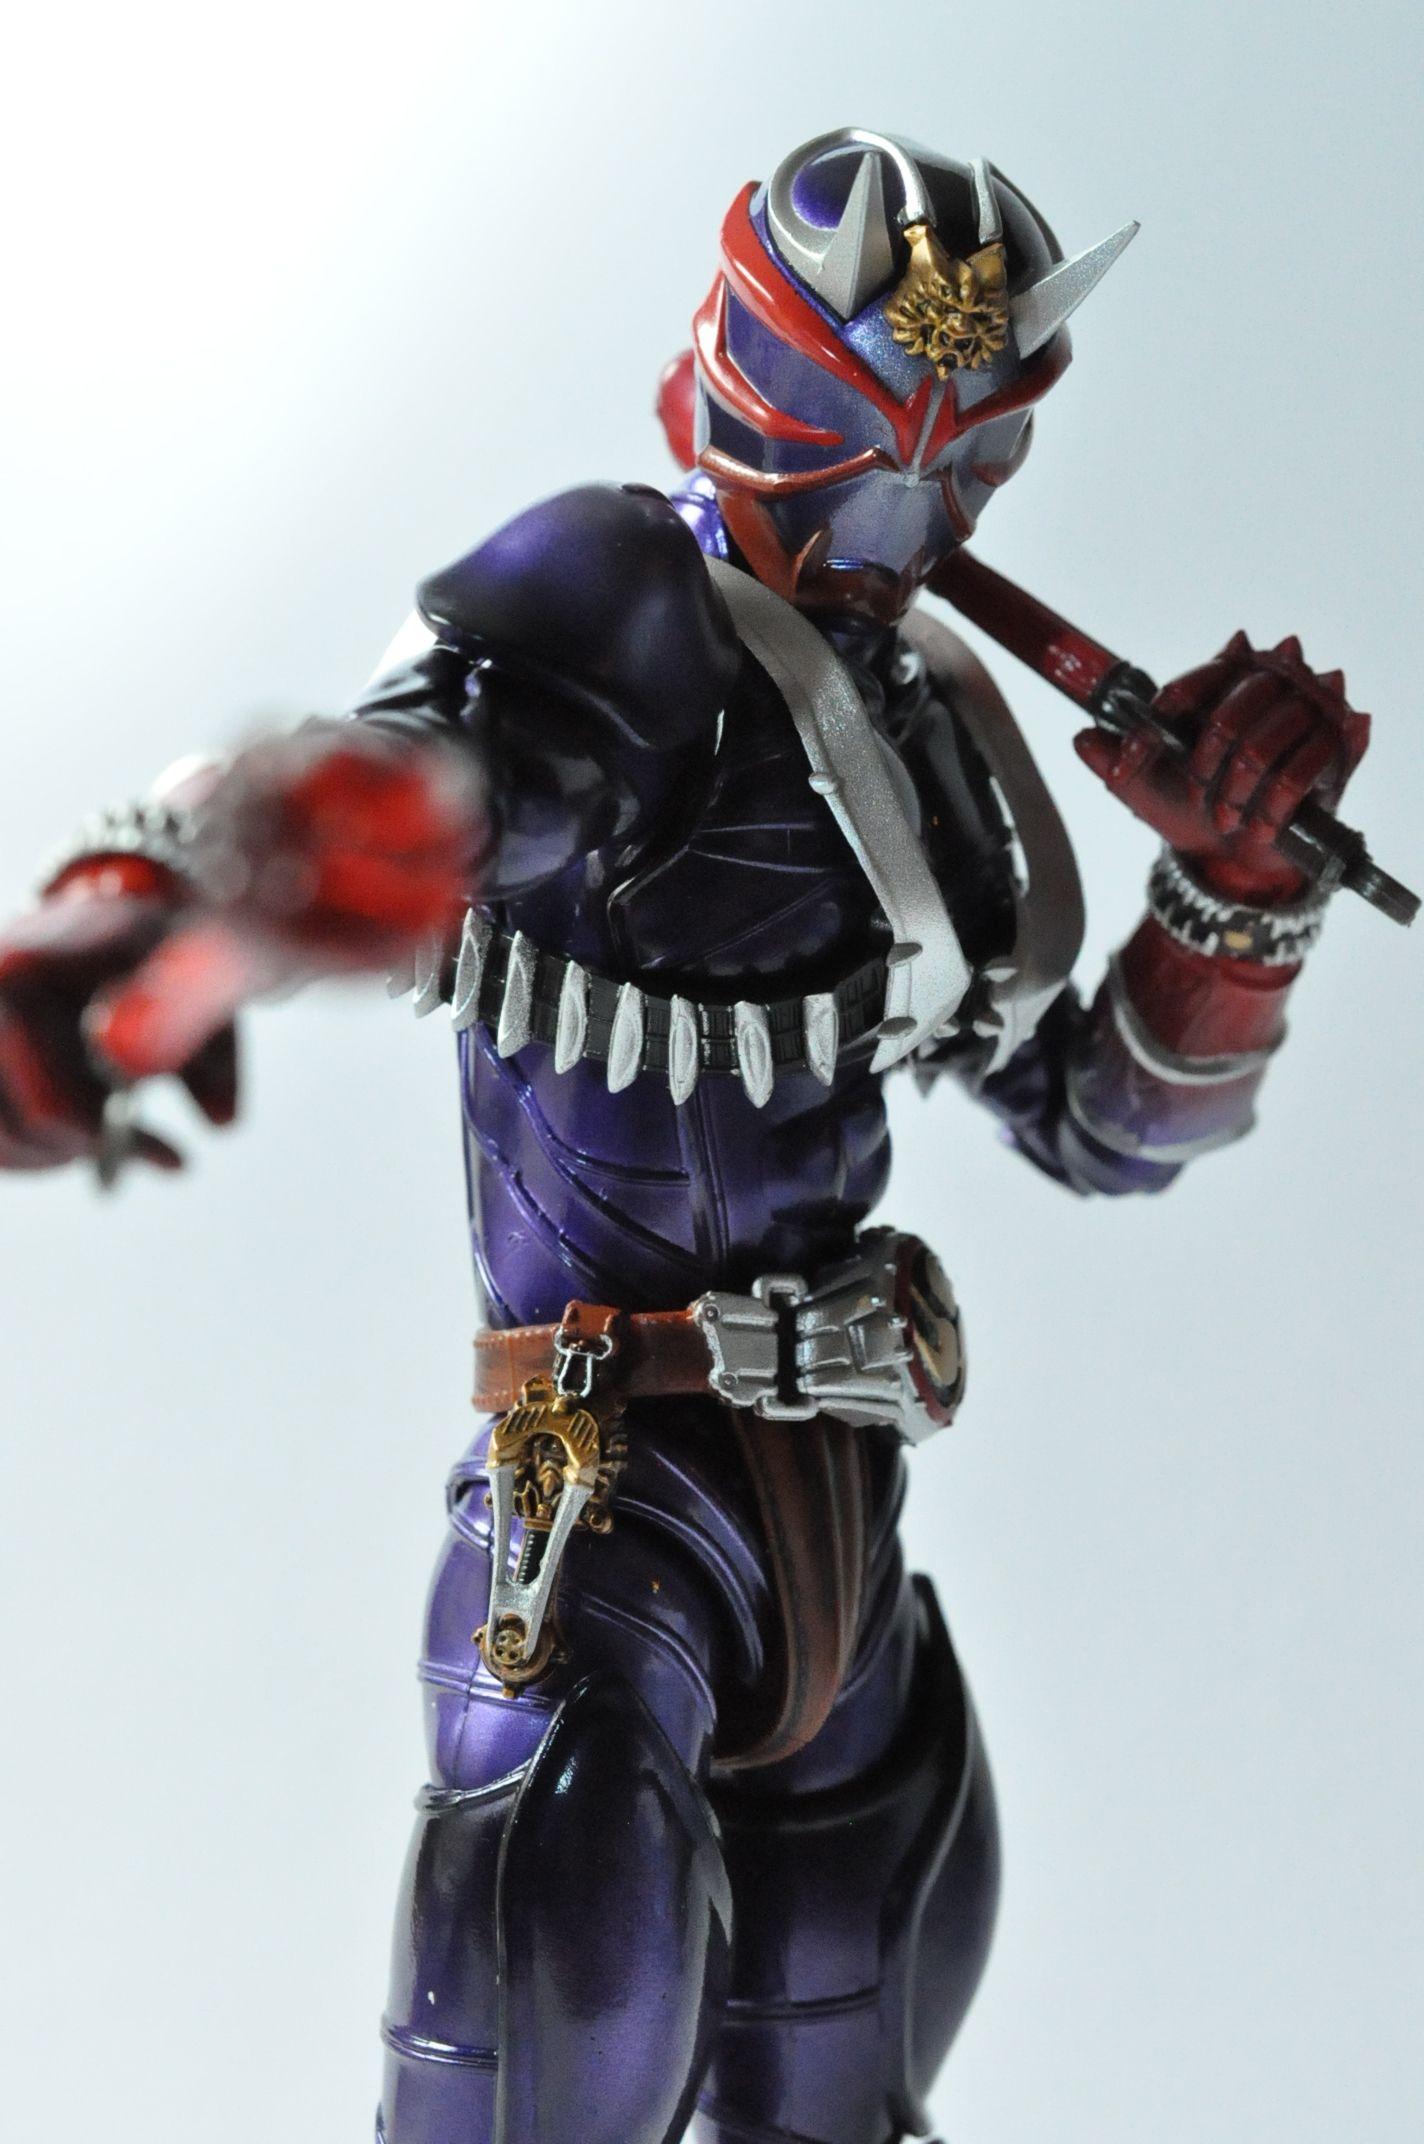 S.H. Figuarts Kamen Rider Hibiki